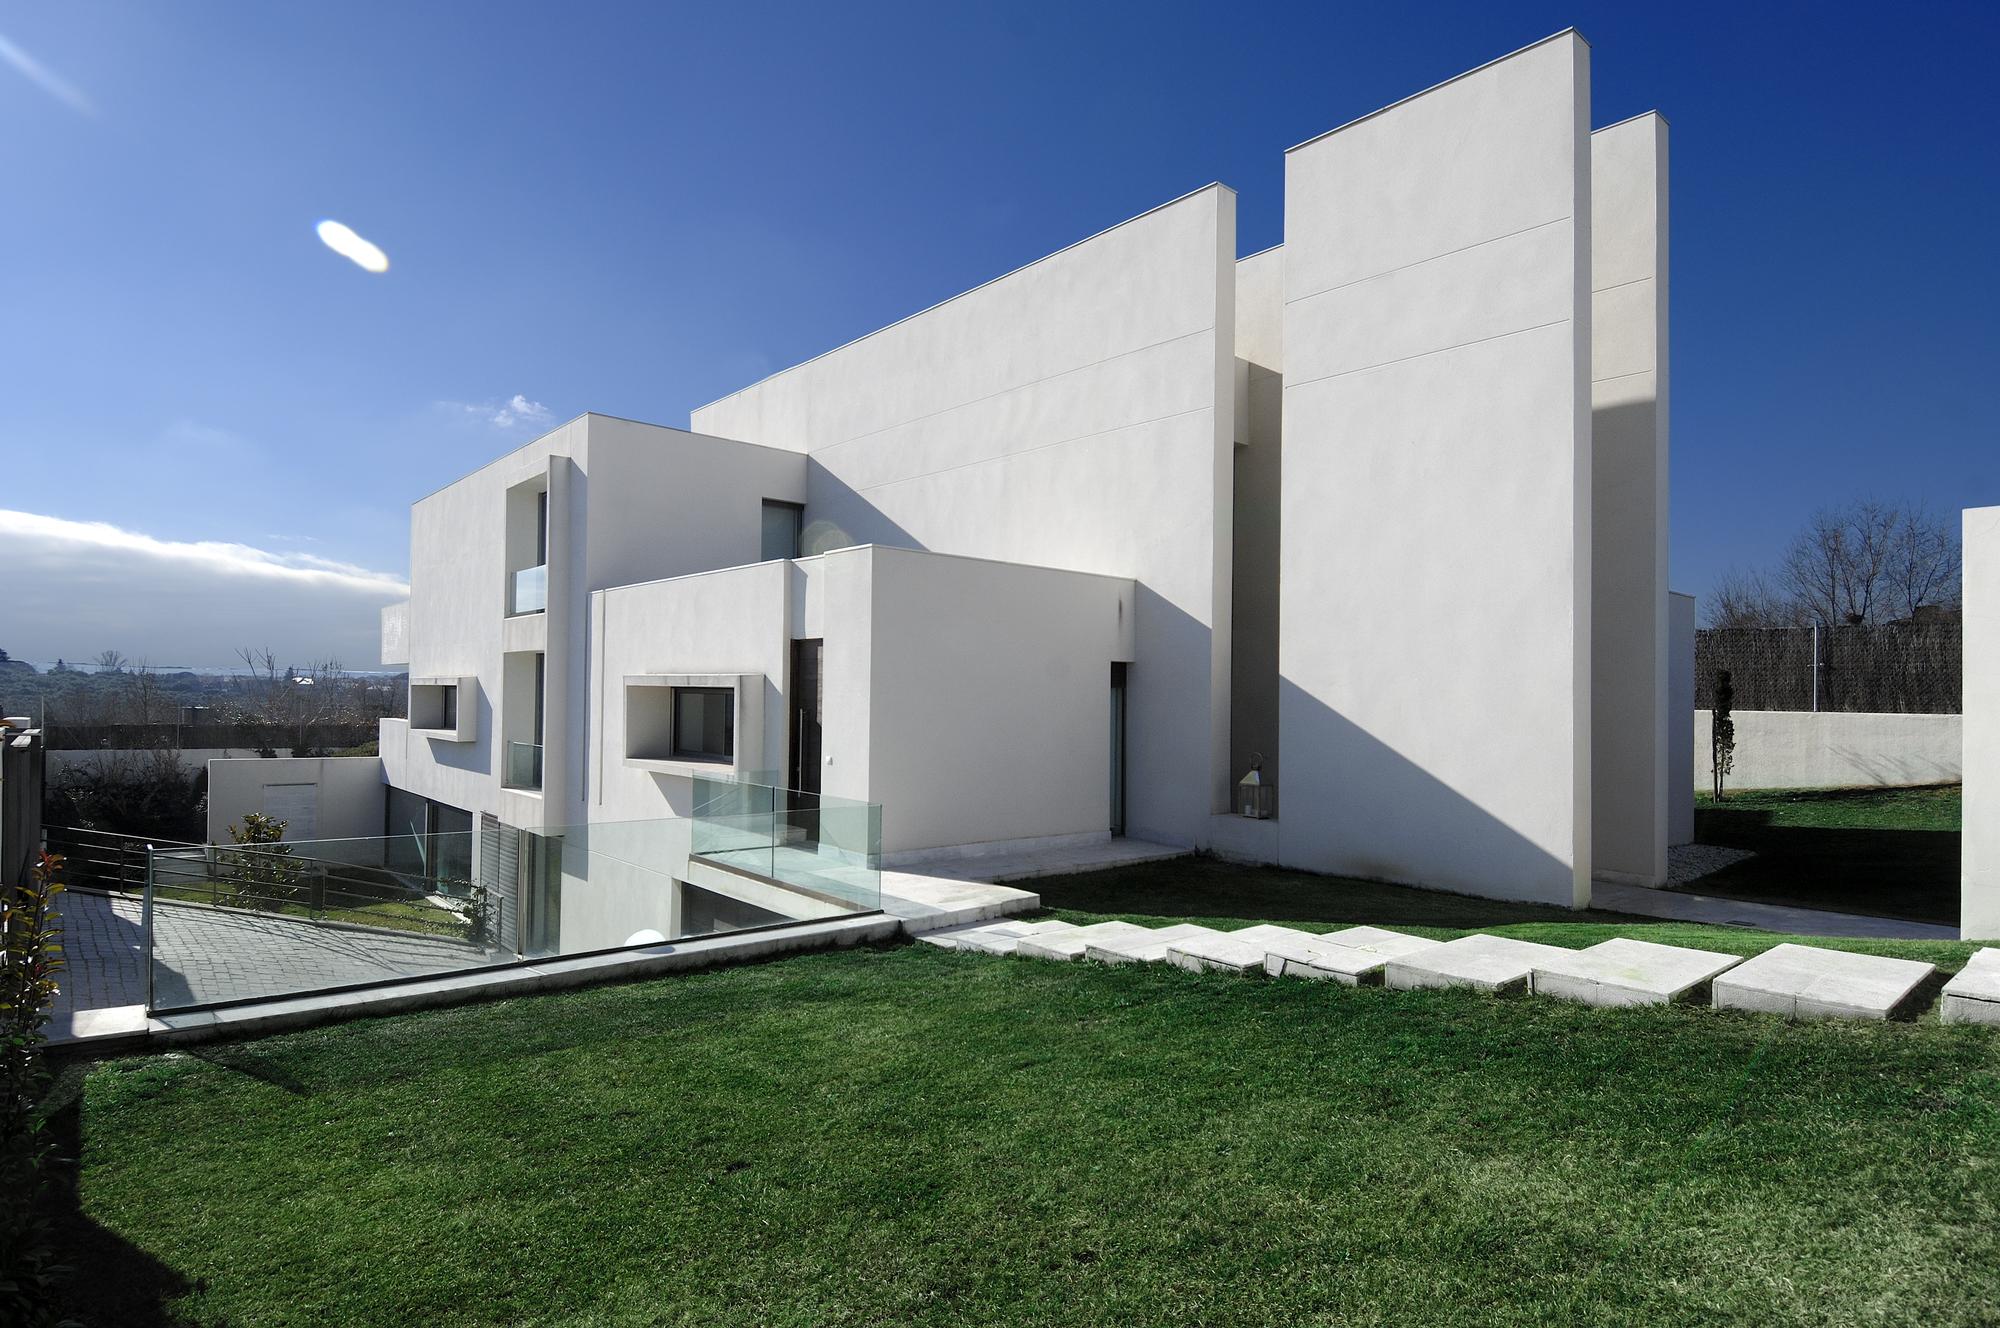 Casa Camarines / A-cero, © Luis H. Segovia